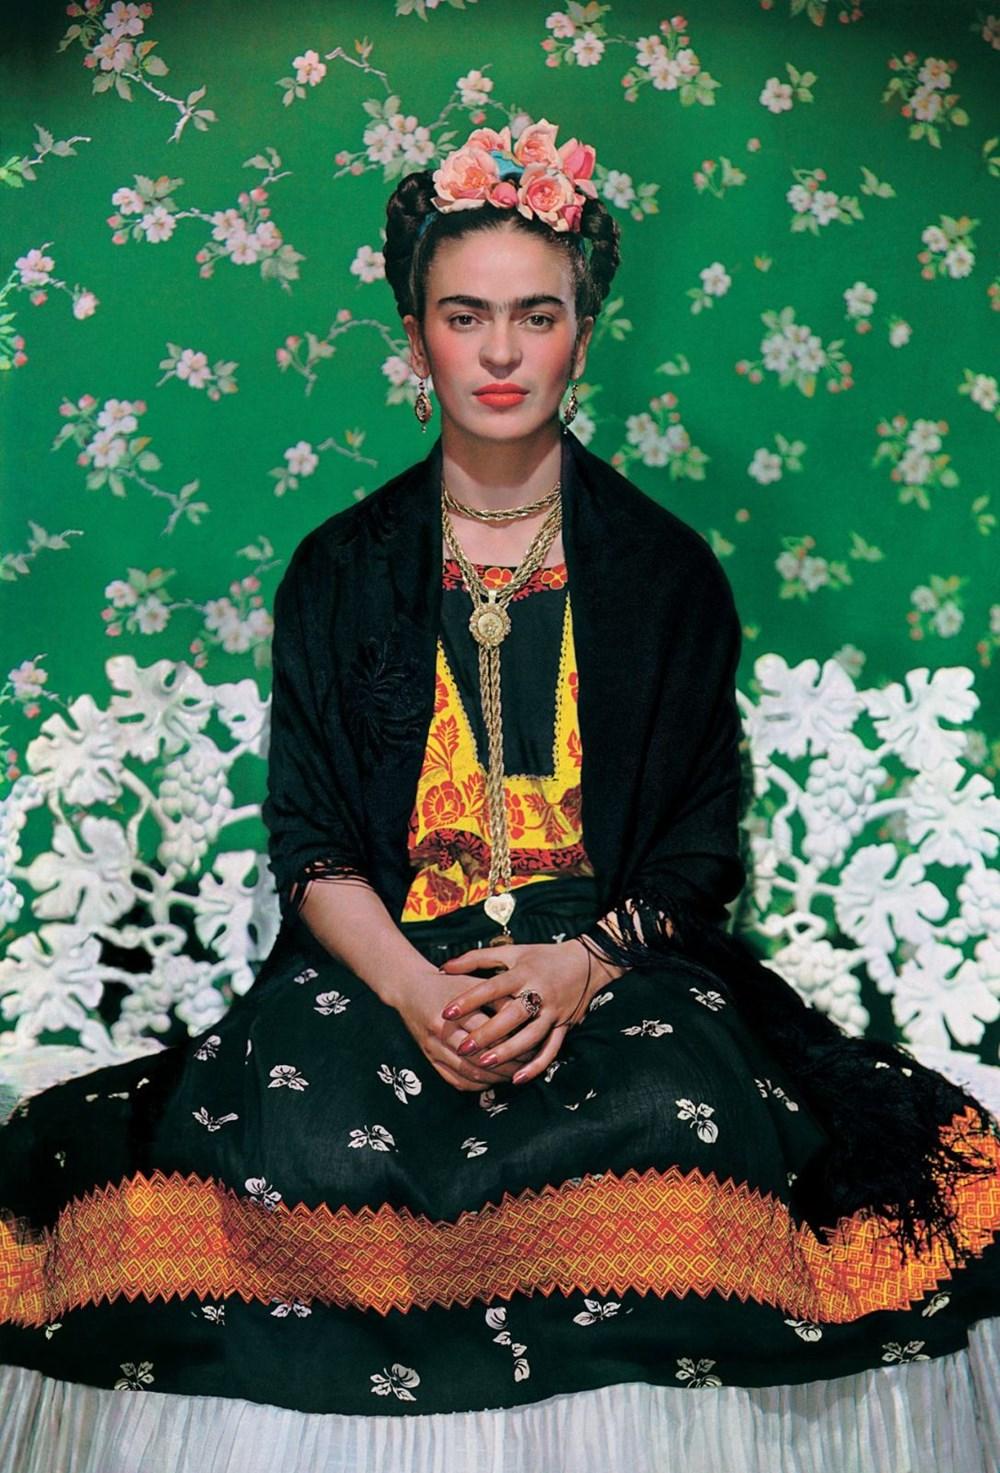 Ressam Frida Kahlo kimdir? (Tahta Bacak Frida Kahlo'nun hayatı) - 16